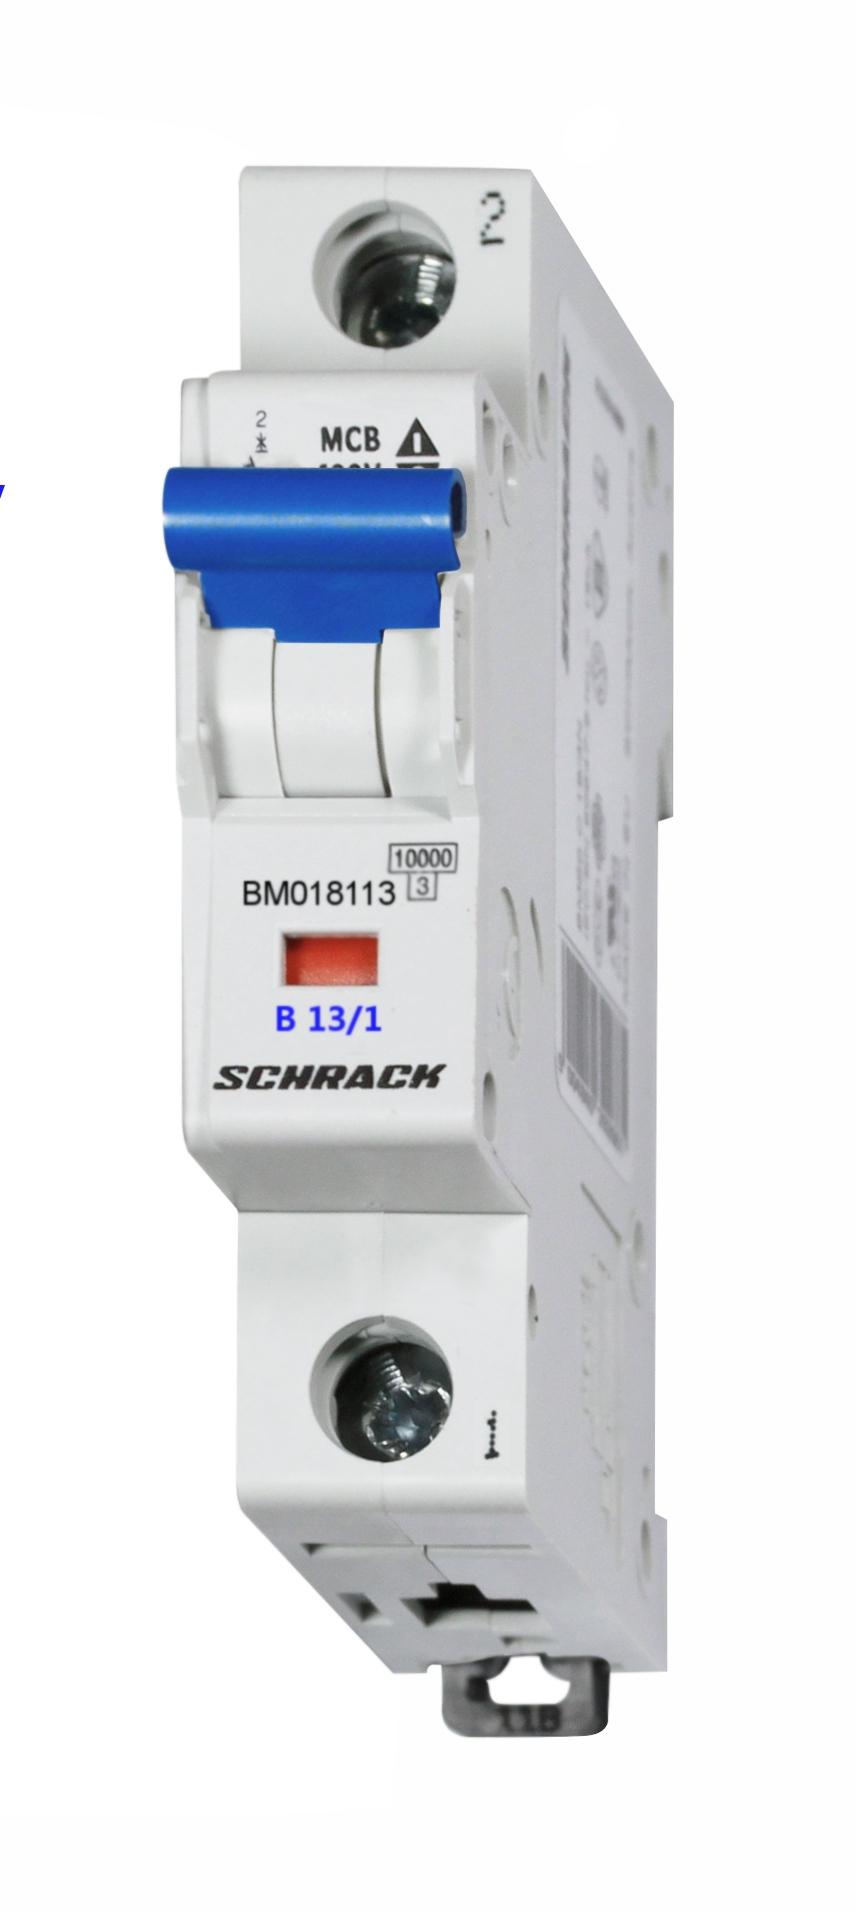 1 Stk Sicherungsautomat, Kennlinie B, 13A, 1-polig, 10kA BM018113--